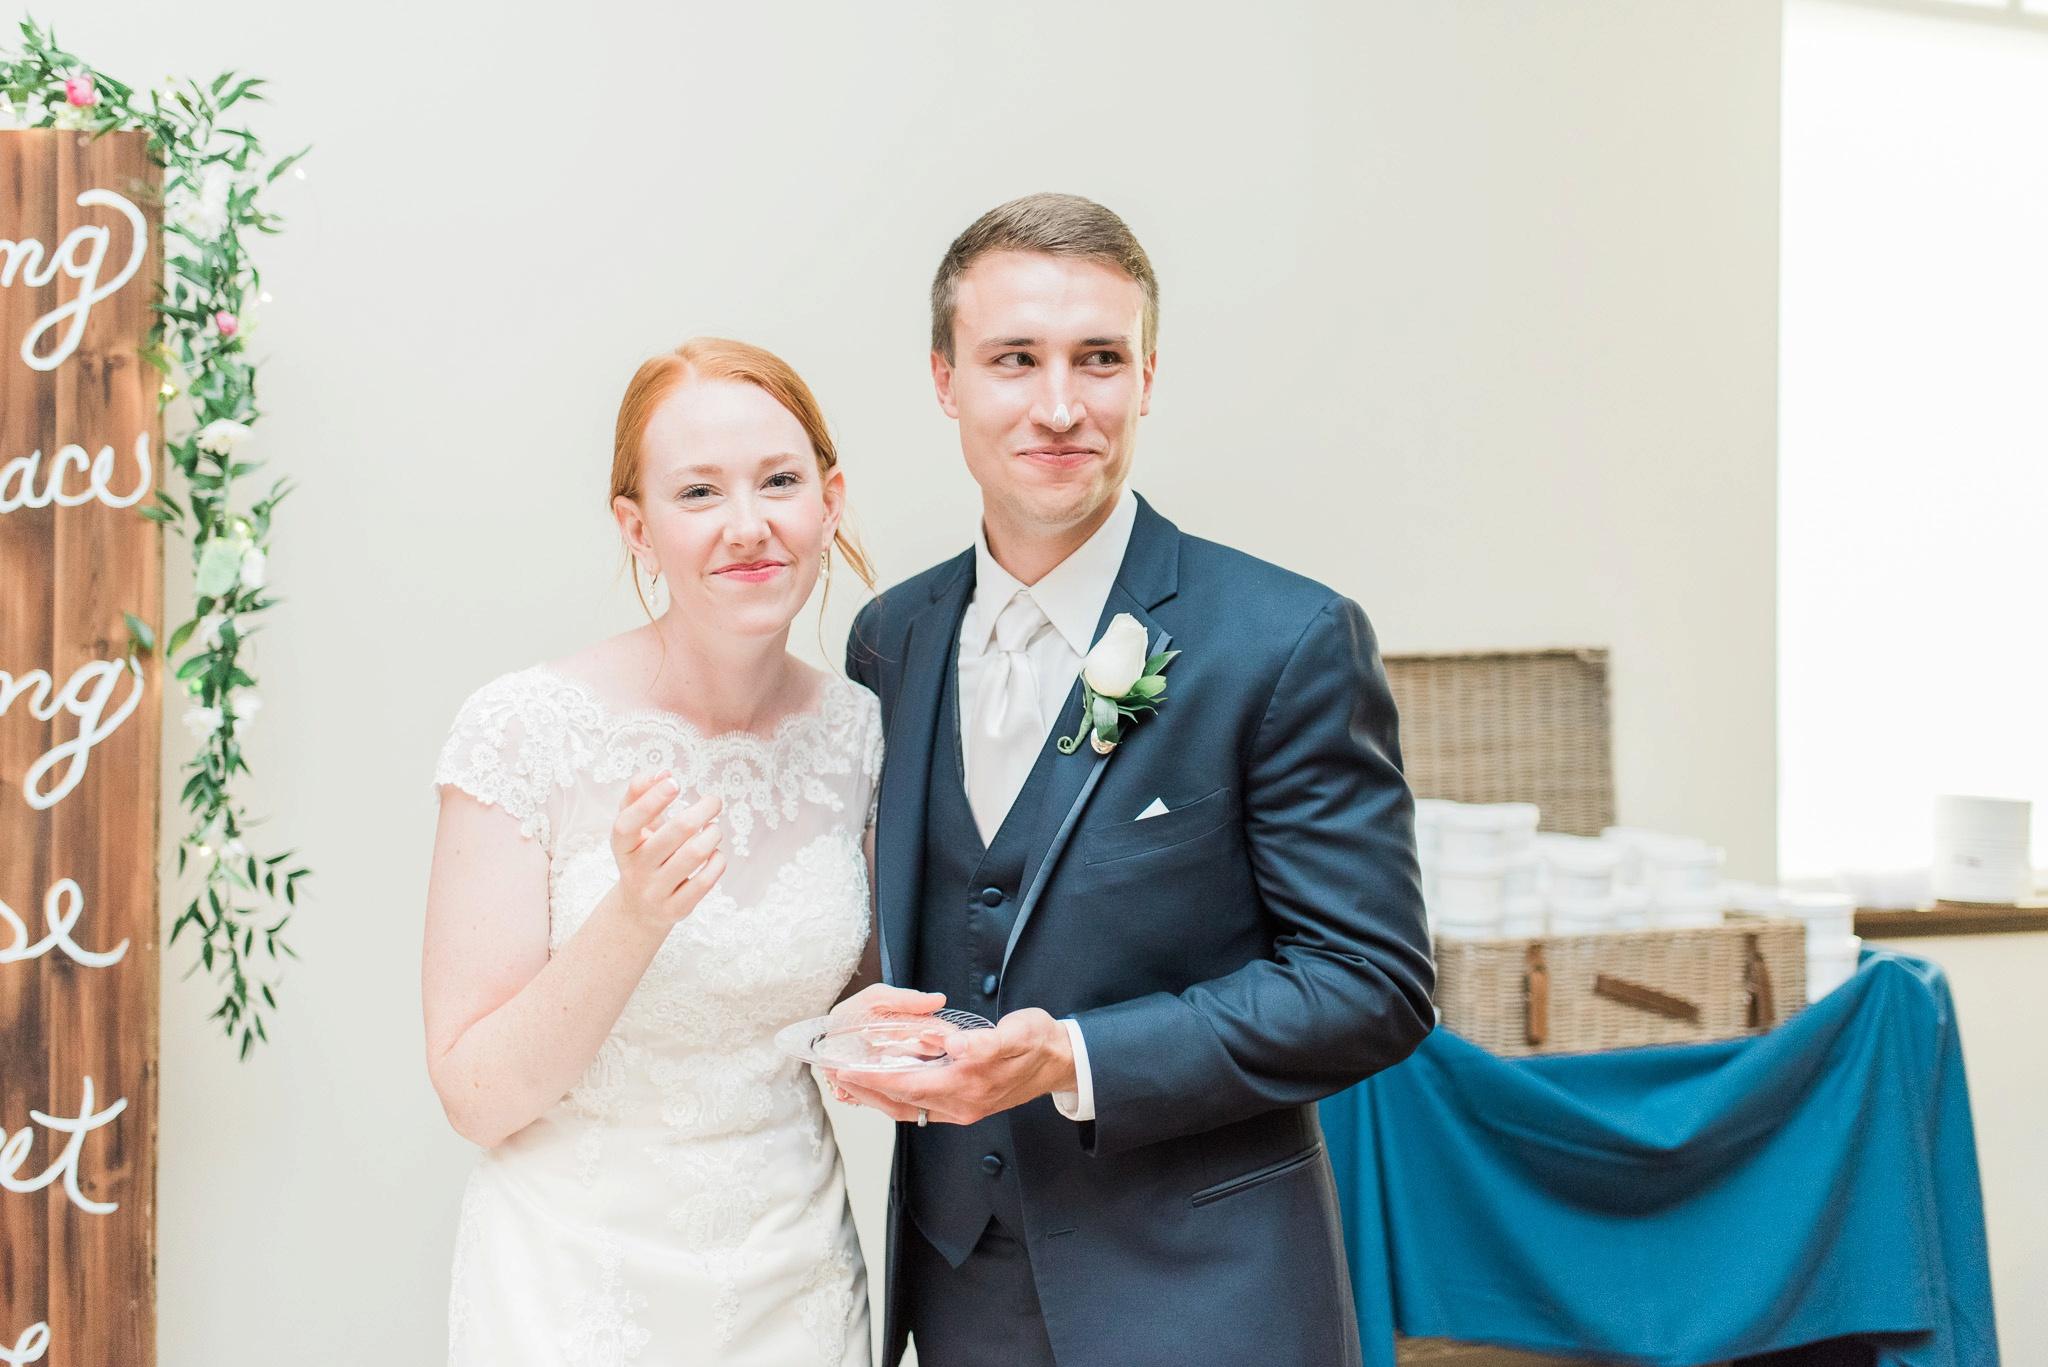 sunbury-ohio-wedding-hannah-johnathan_0134.jpg